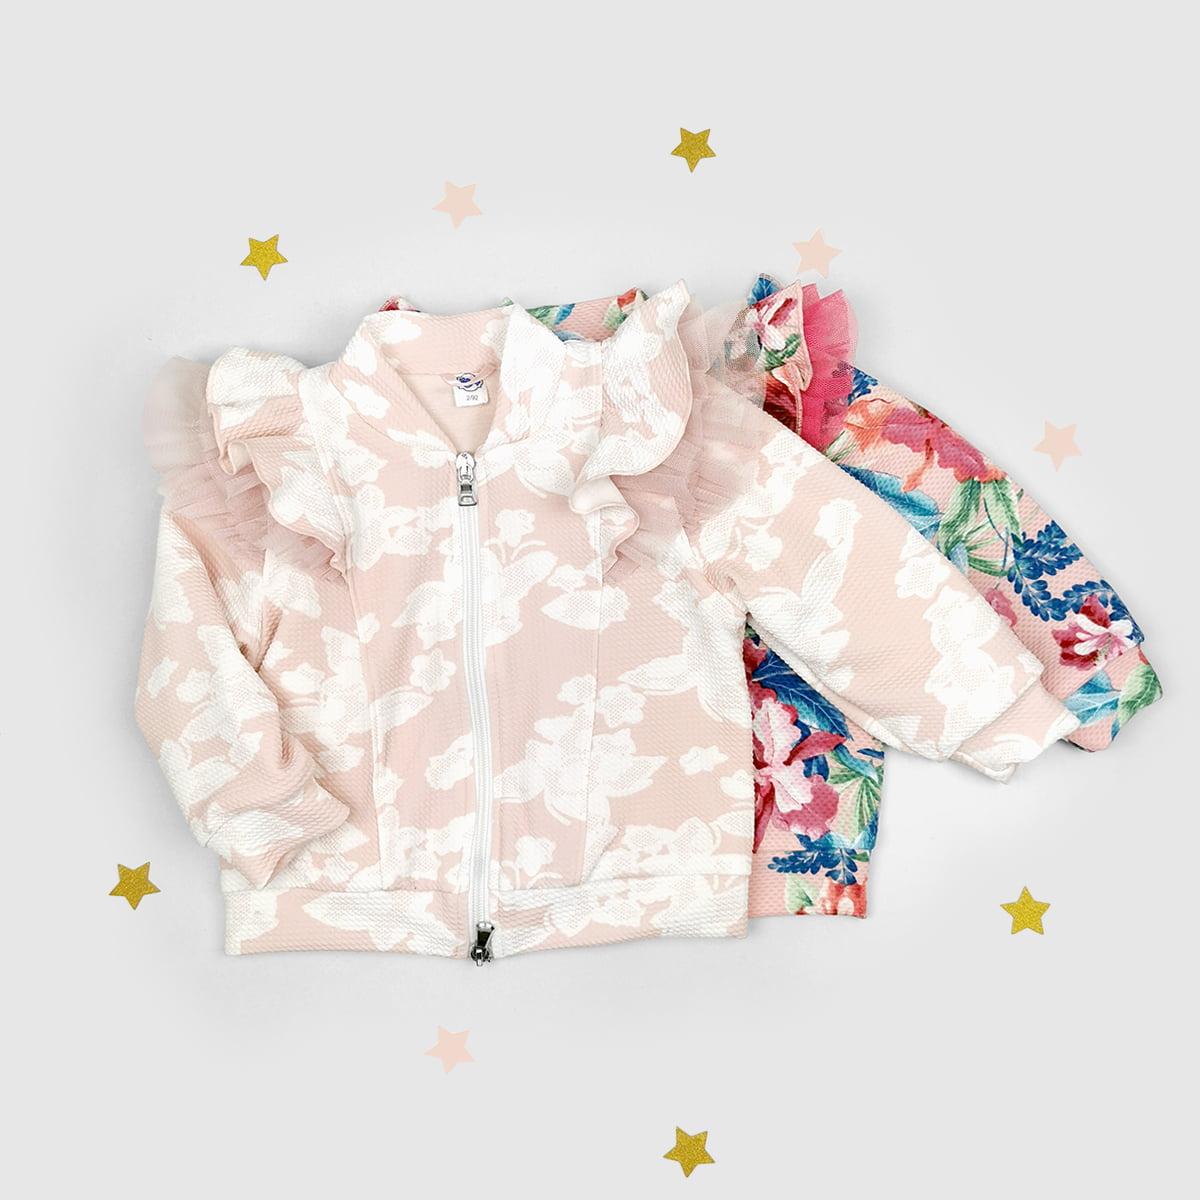 dvije boje šara jaknica za bebe i djevojčice